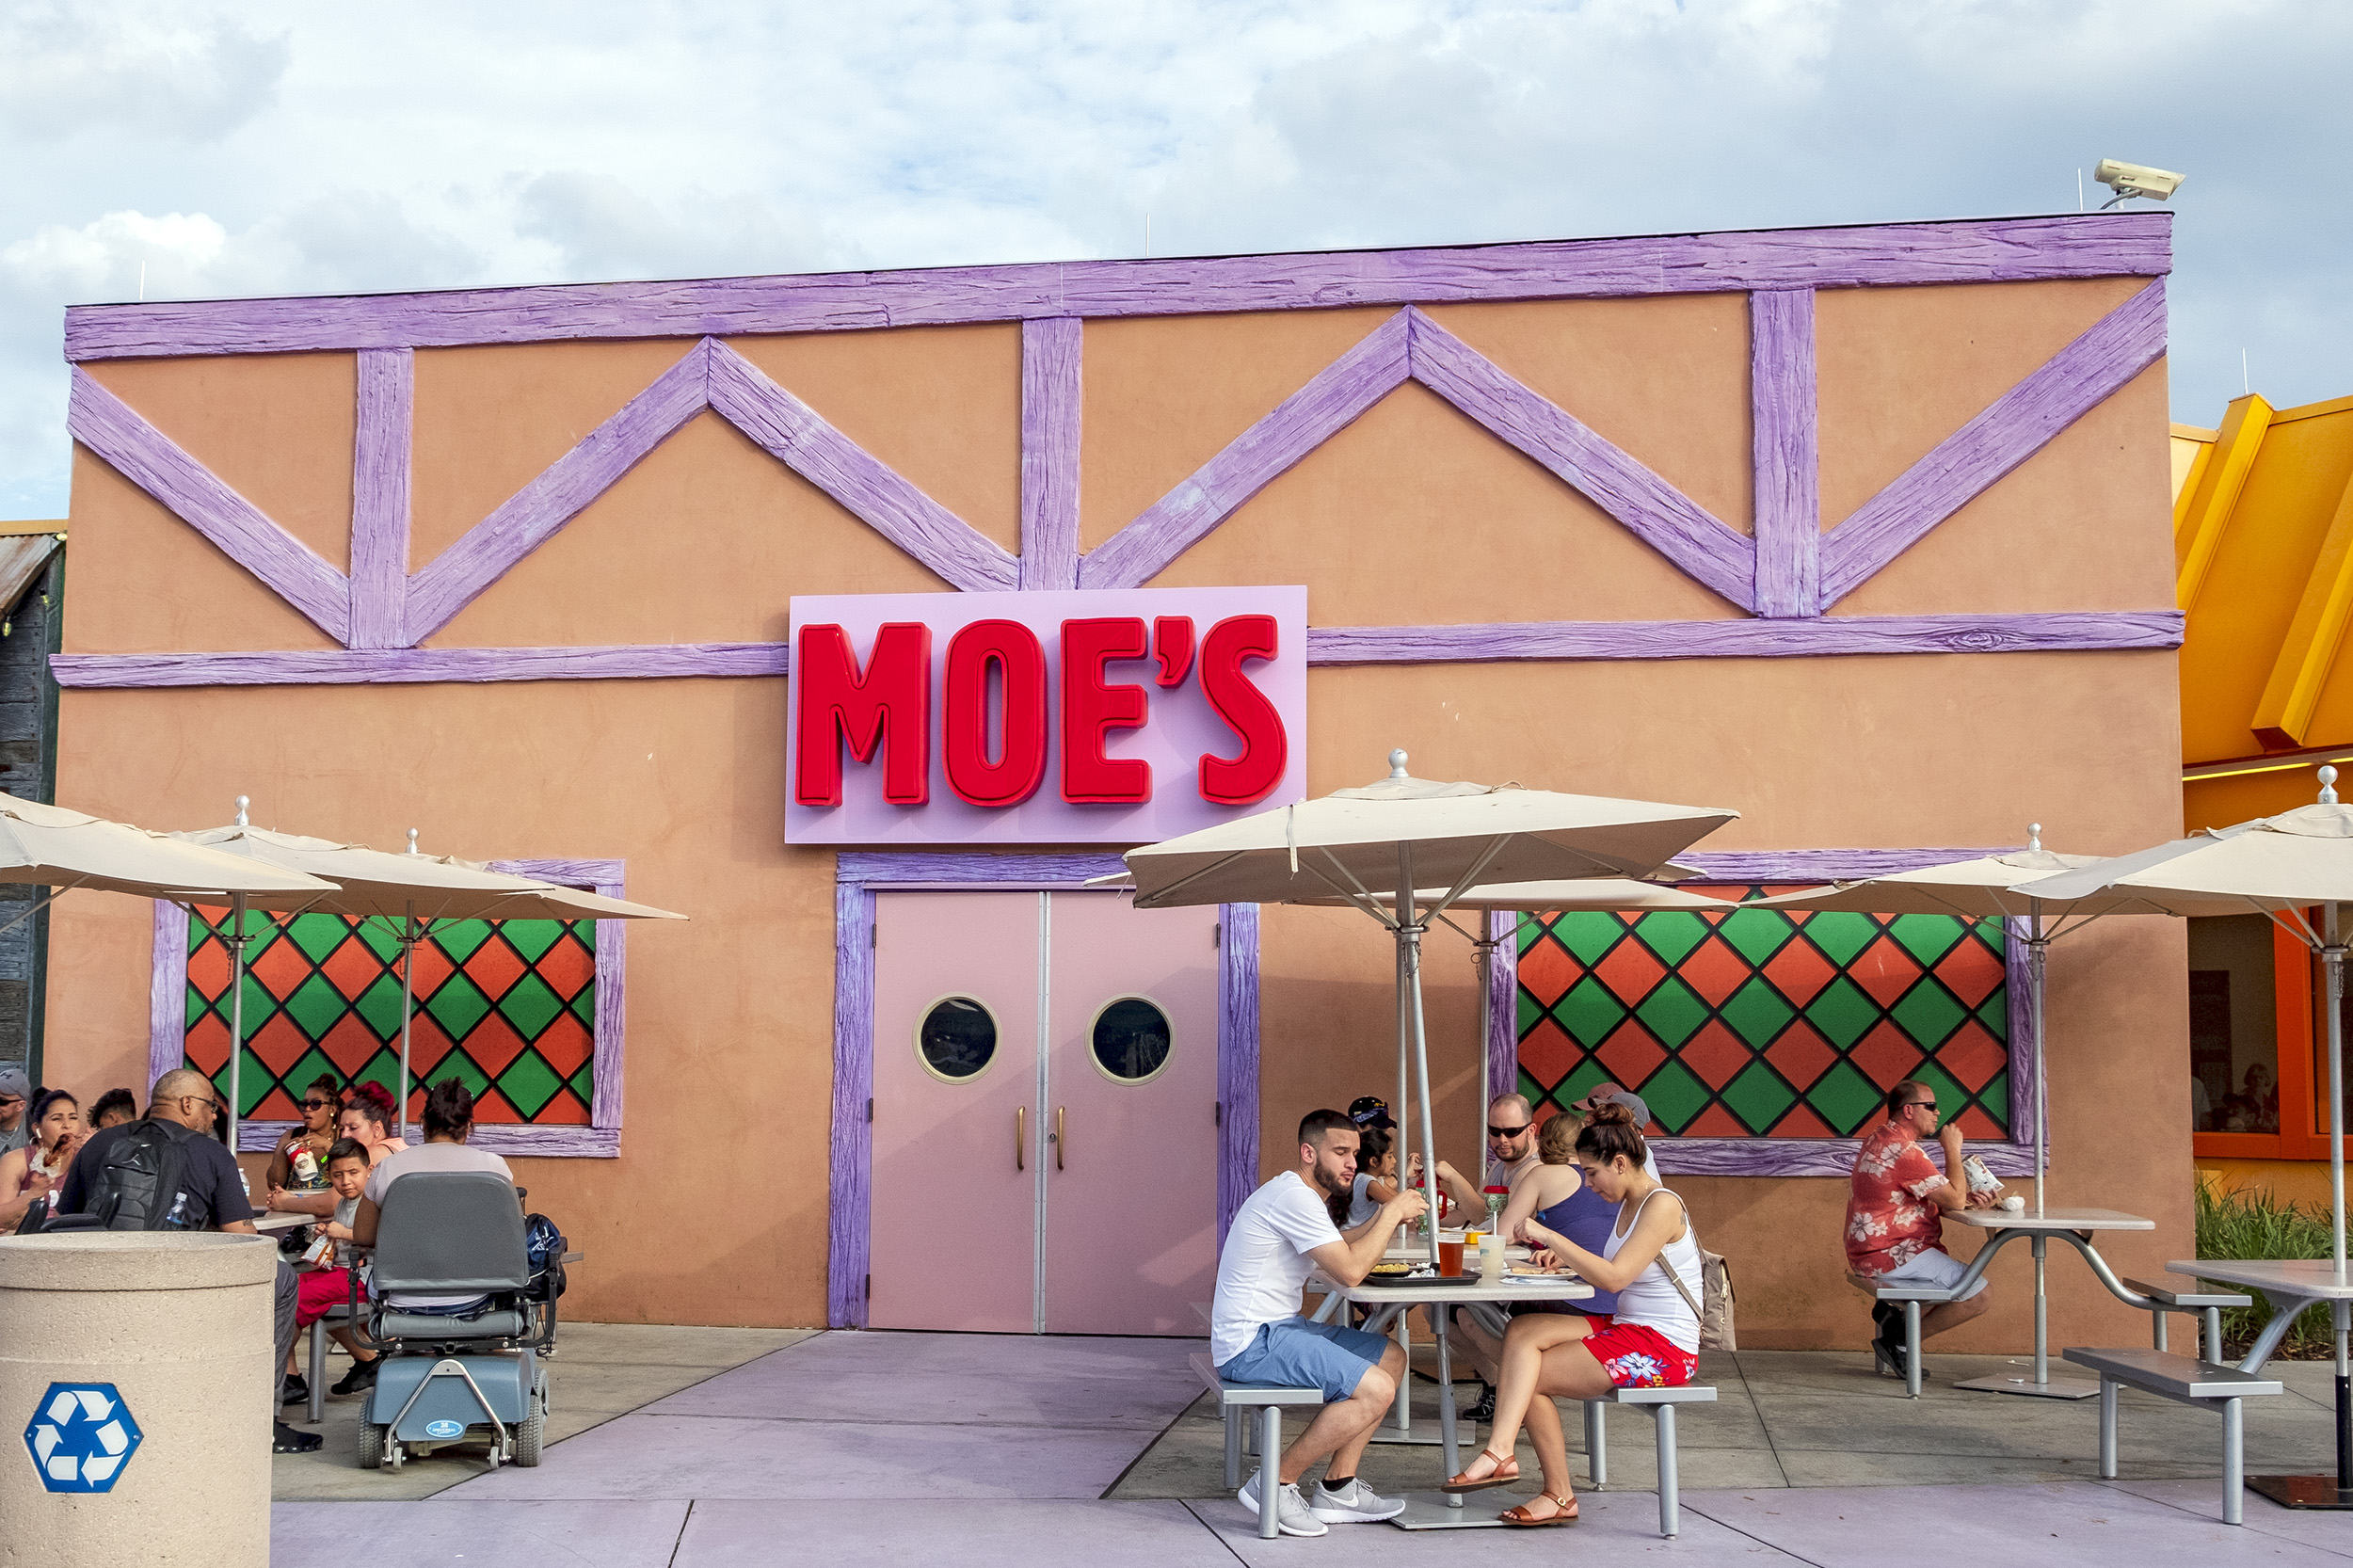 Moe's Tavern Simpsons Universal Studios Florida